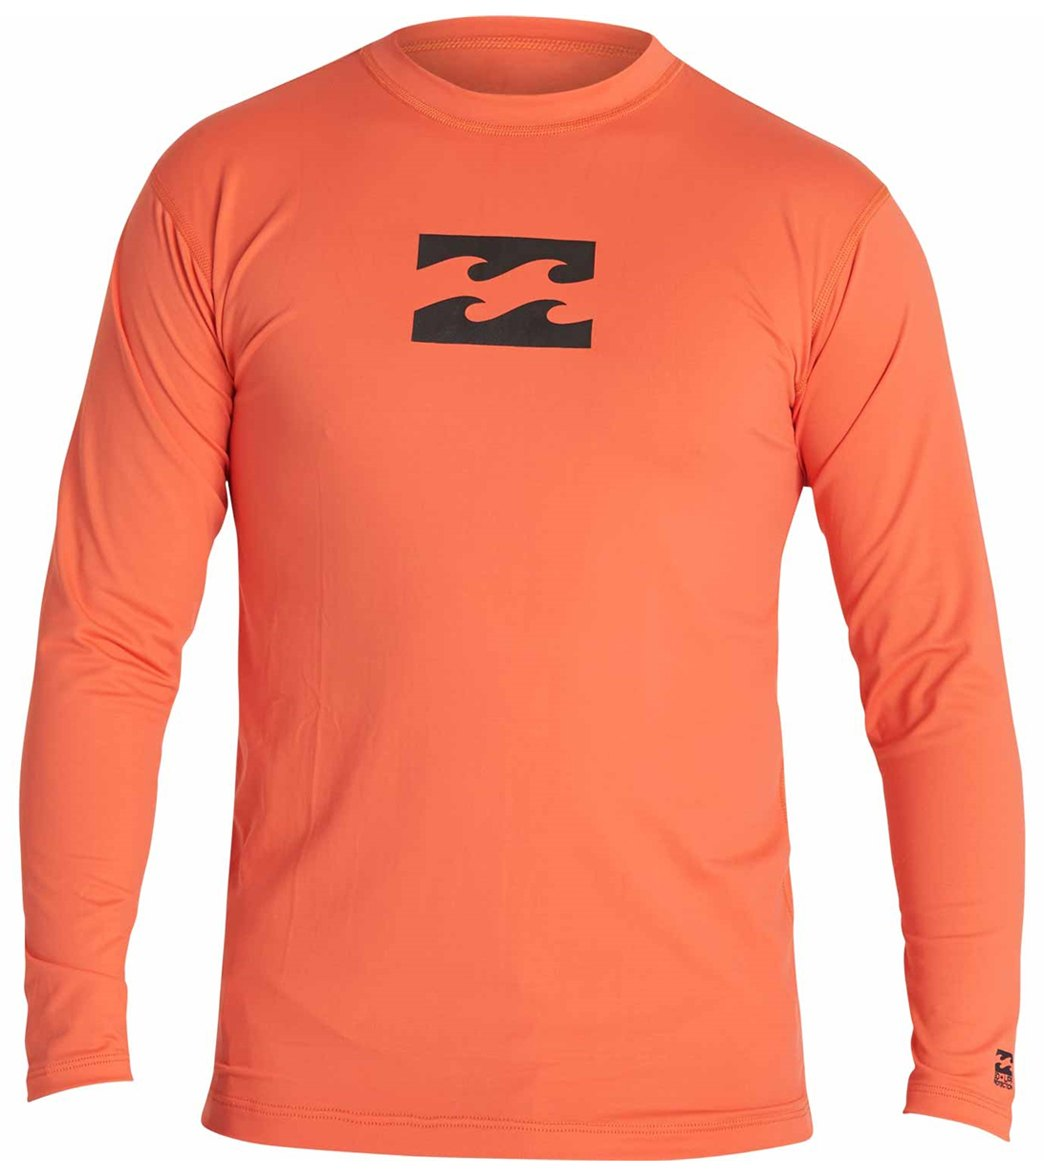 df3bf507 Billabong Boys' All Day Wave Long Sleeve Swim Shirt at SwimOutlet.com